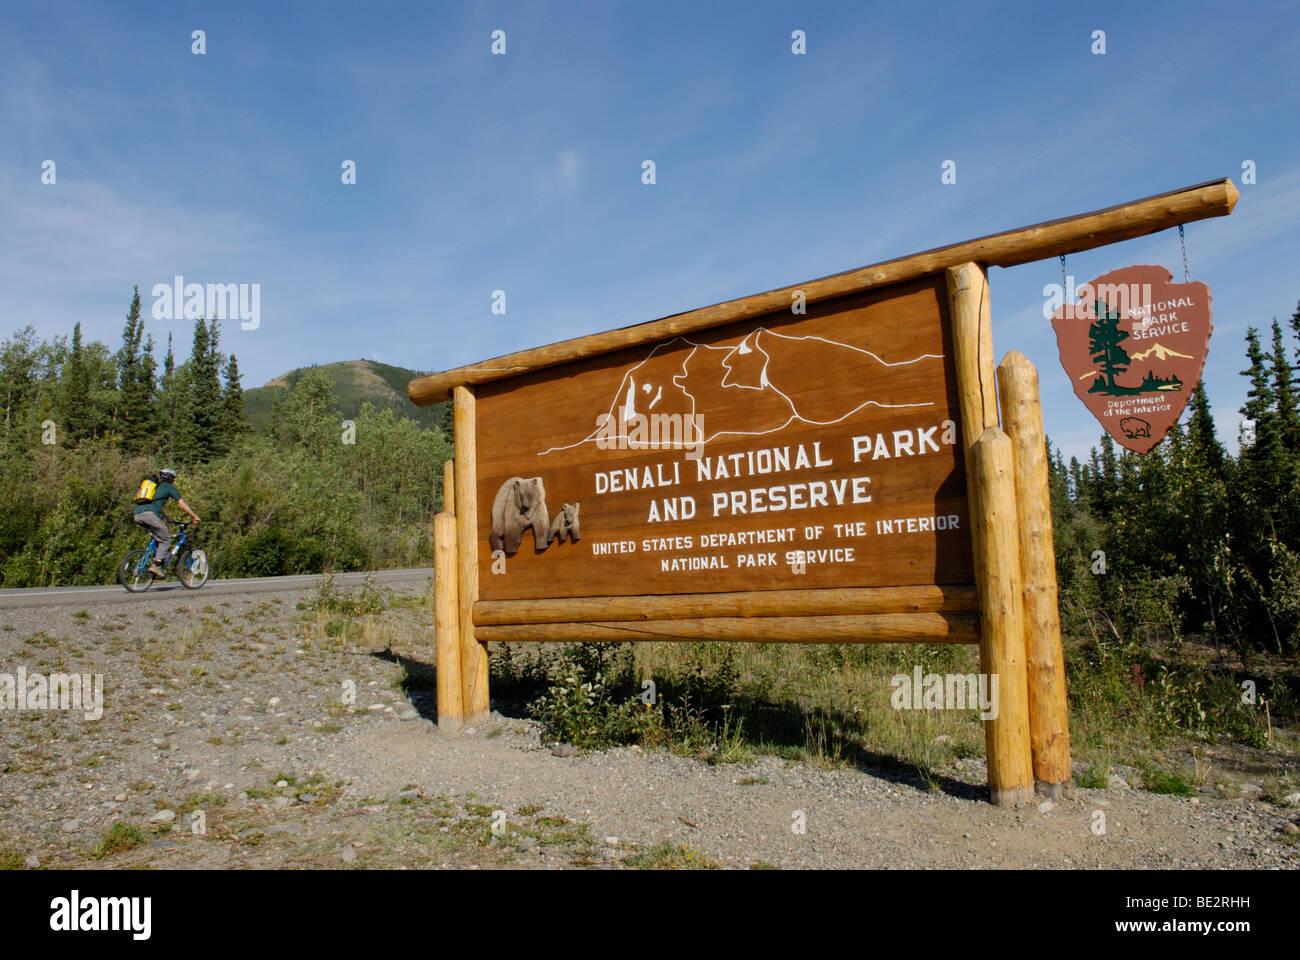 Denali Nationalpark Ortseingangsschild mit Radfahrer Stockbild